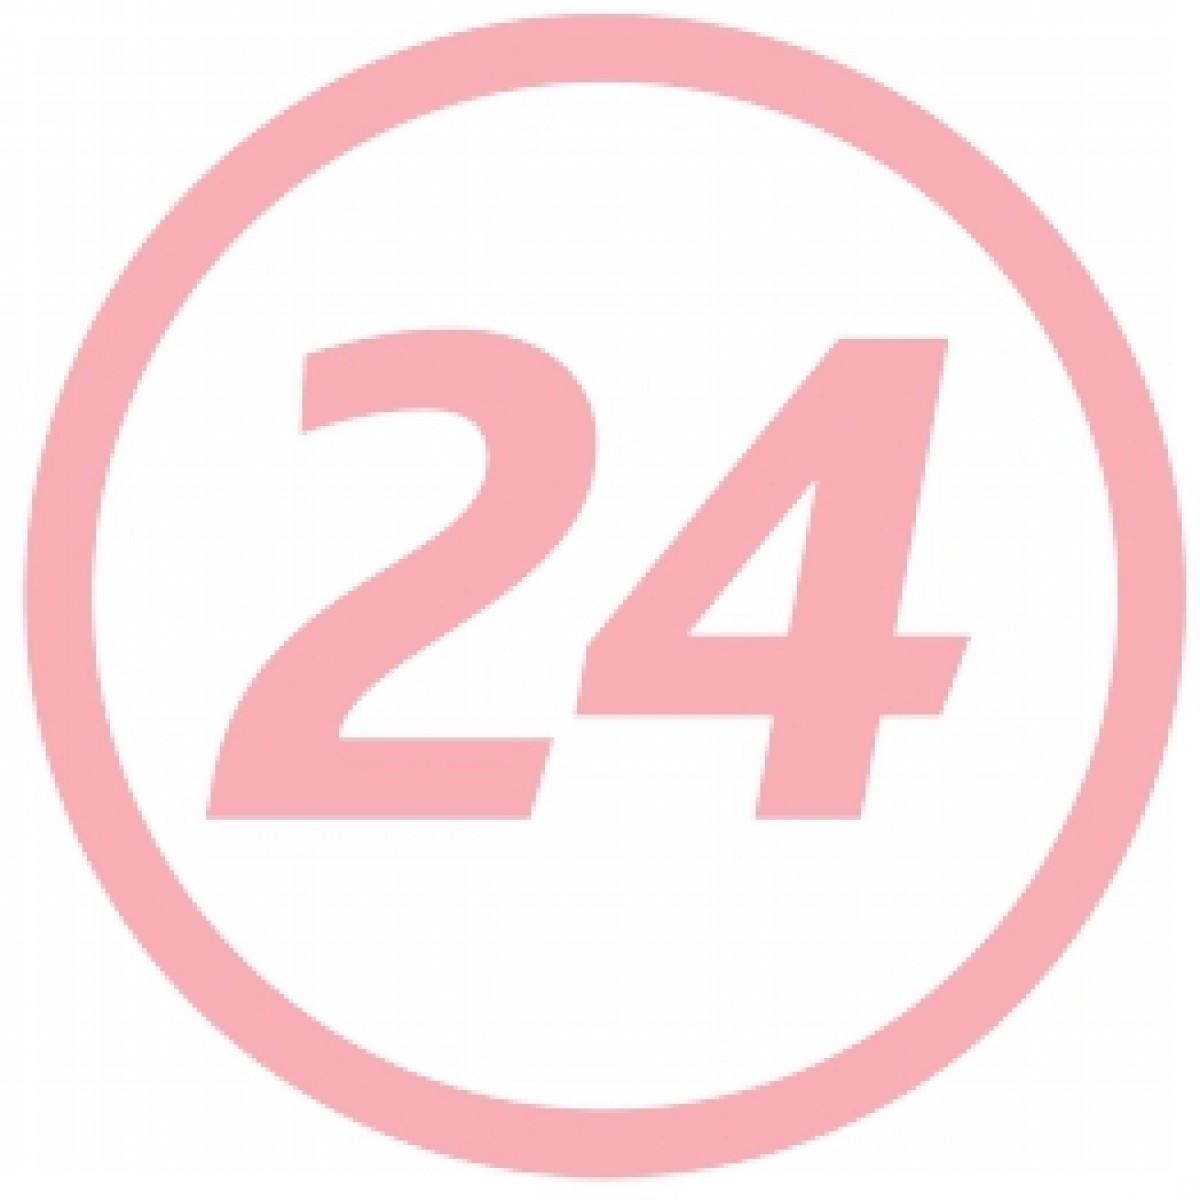 Dalin Scutece 4 Maxi 7-18 Kg, Scutece, 70buc